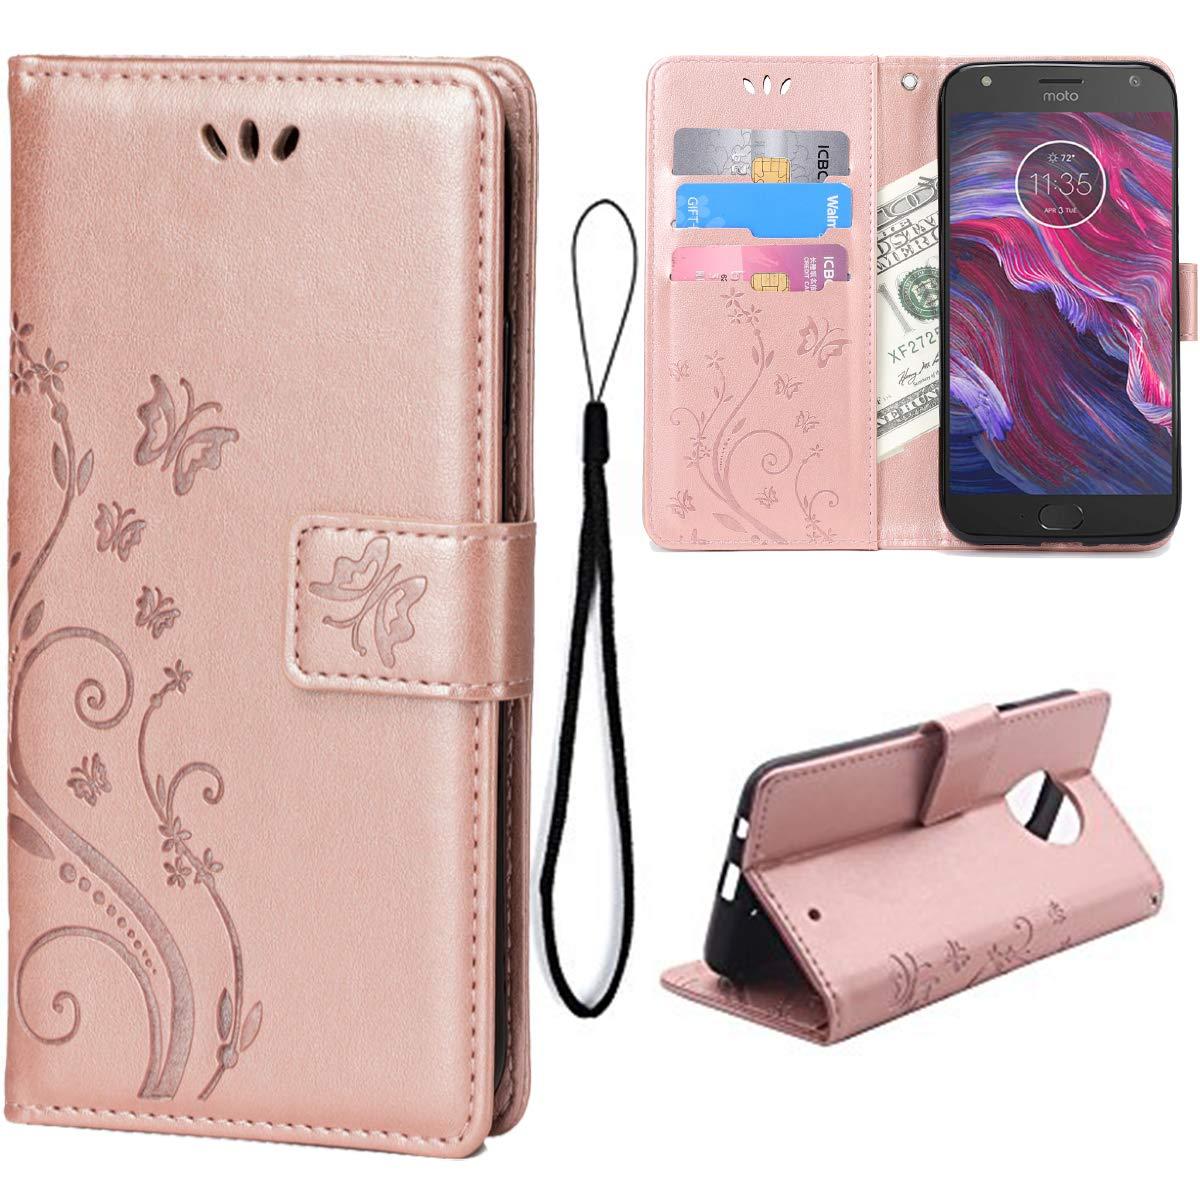 Wallet Case for Motorola Moto X4, 3 Card Holder Embossed Butterfly Flower PU Leather Magnetic Flip Cover for Motorola Moto X4(Rose Gold)